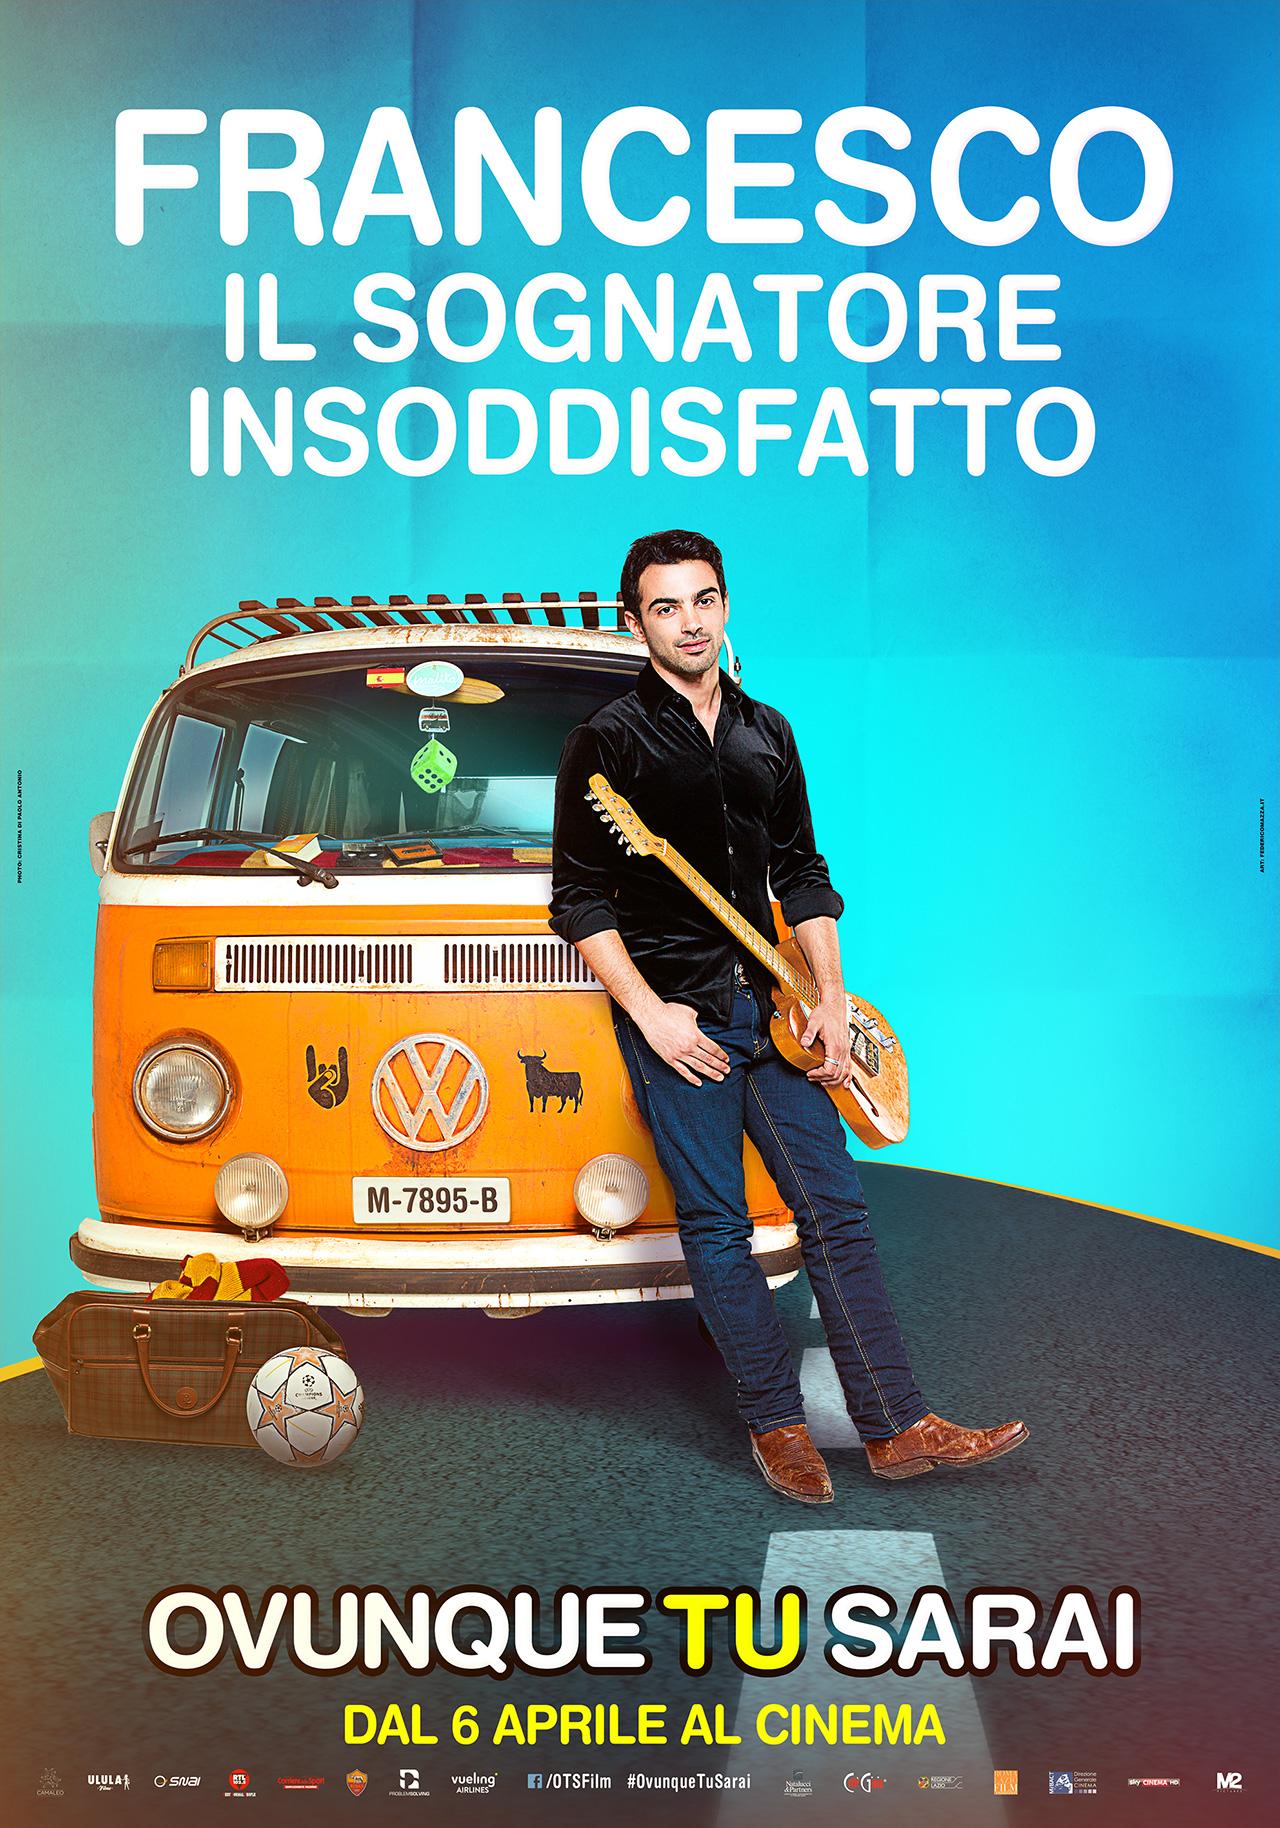 Ovunque tu sarai - character poster in esclusiva  con Francesco